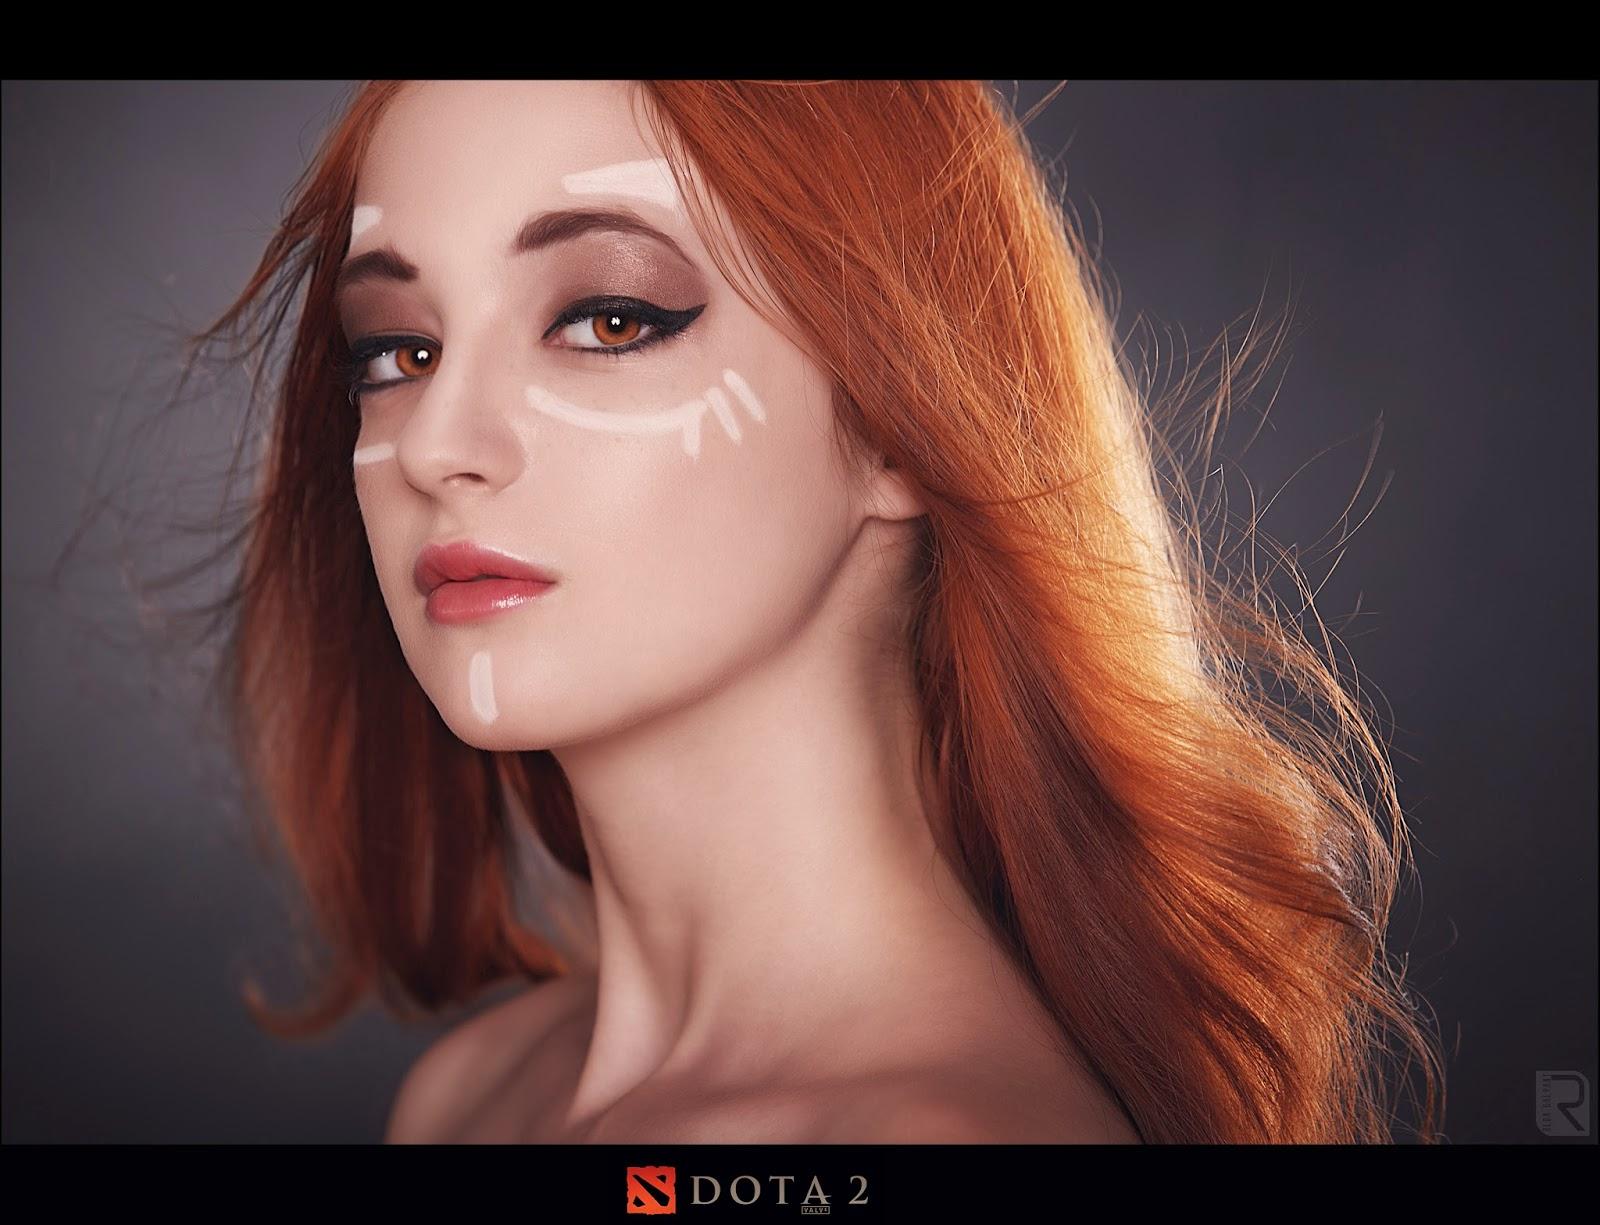 Dota 2 Wallpapers Dota 2 Cosplay   Lina by ringeka 1600x1225